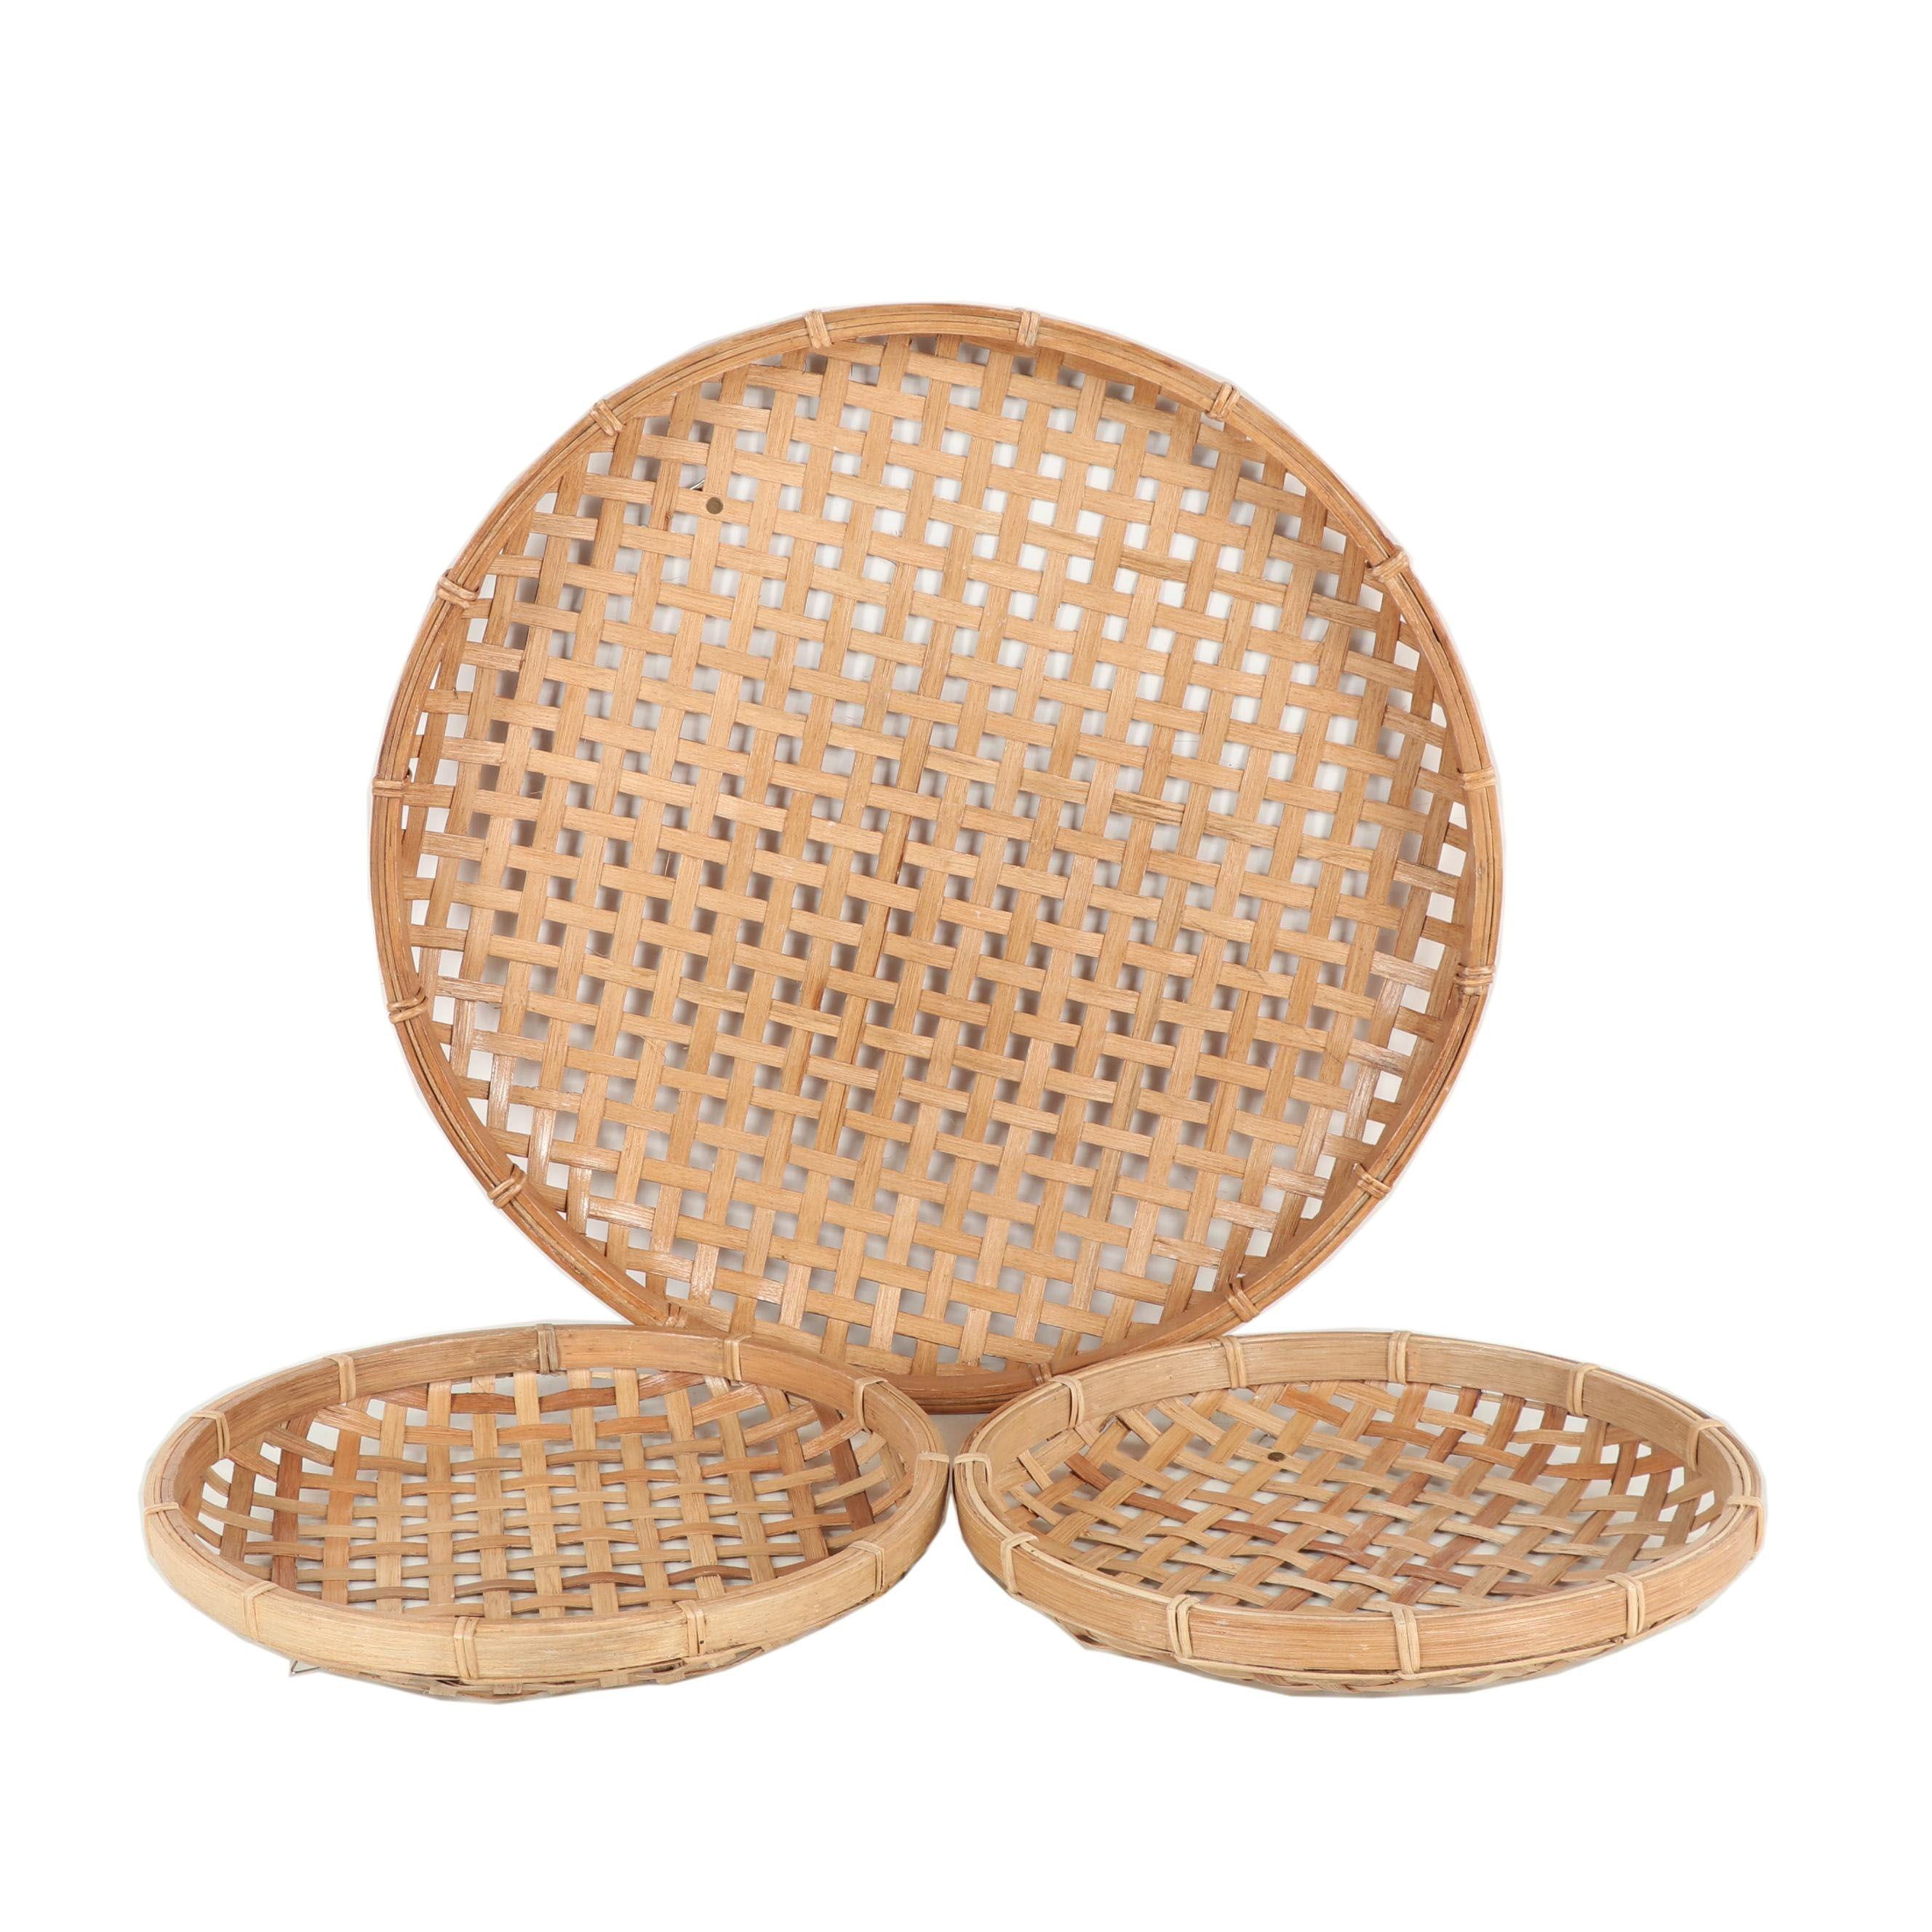 Large Round Wicker Basket Wall Decor